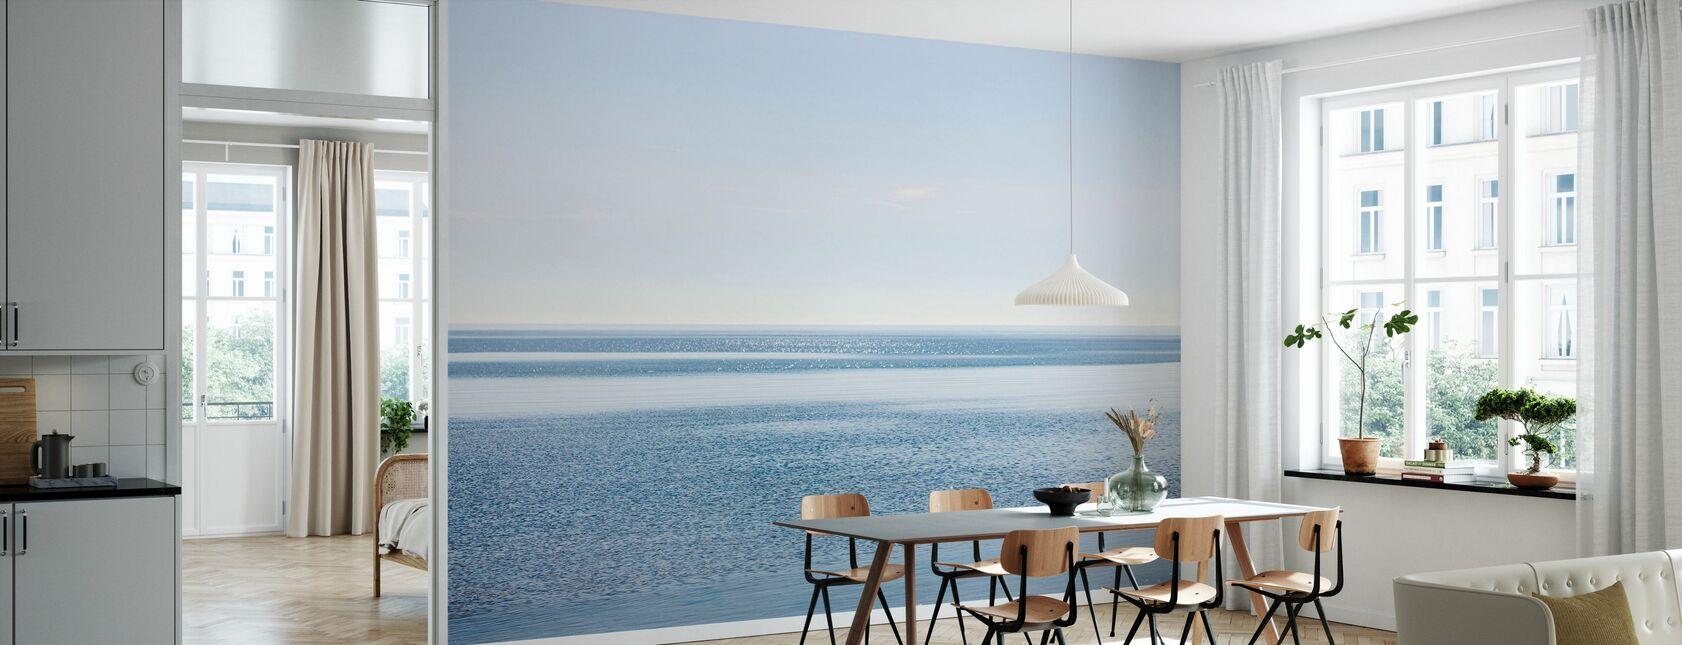 Sparkling Sea - Wallpaper - Kitchen